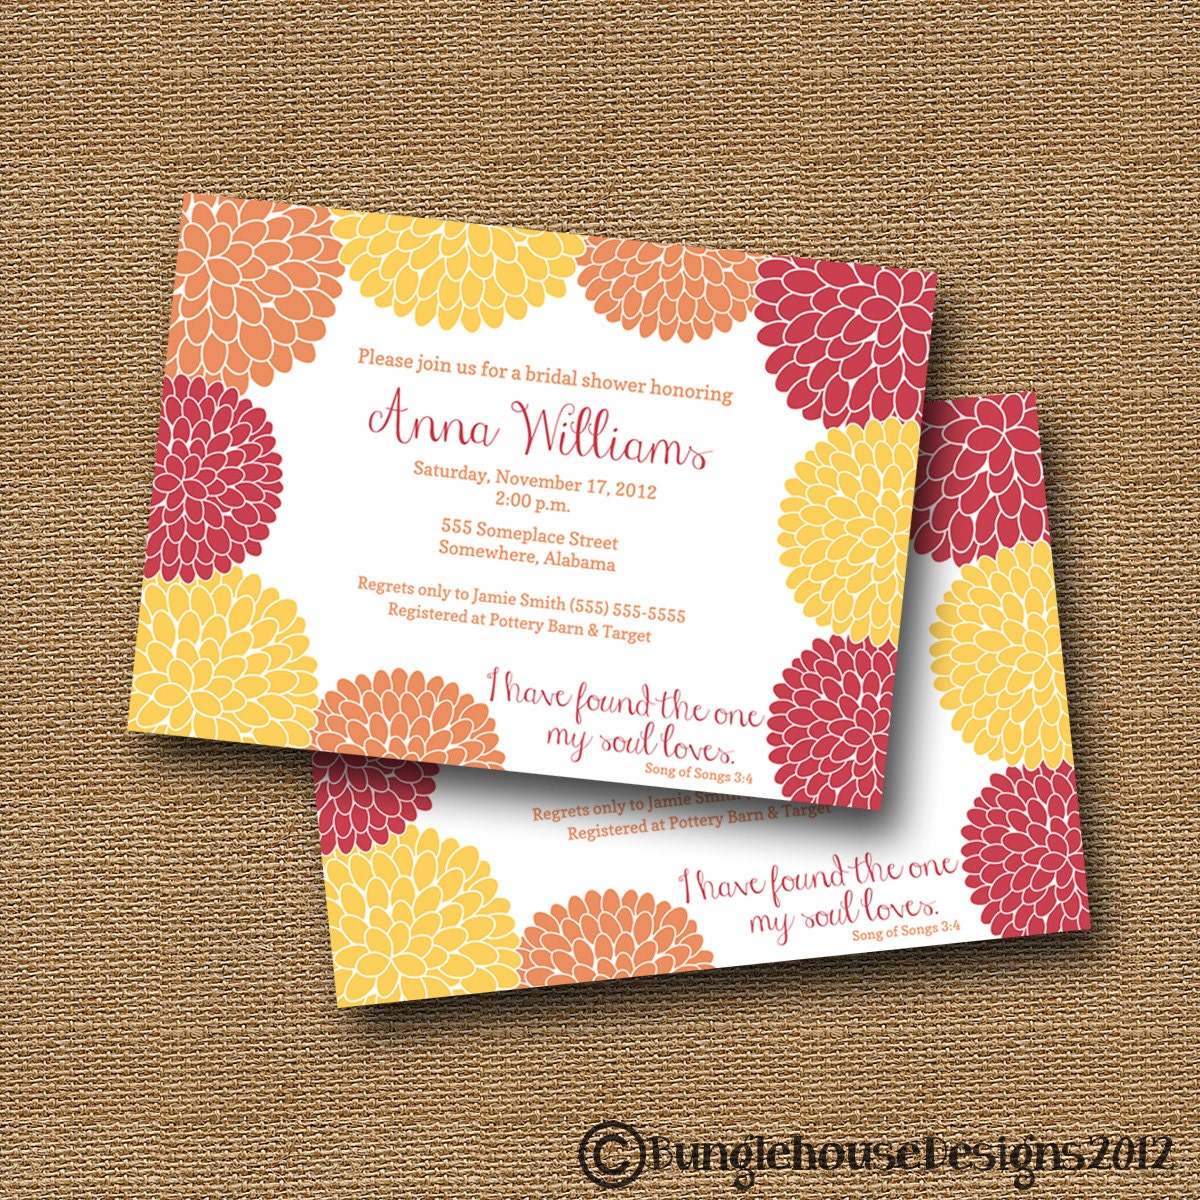 Bridal Shower Wedding Invitation DIY PRINTABLE Floral – Bible Verses for Wedding Invitation Cards